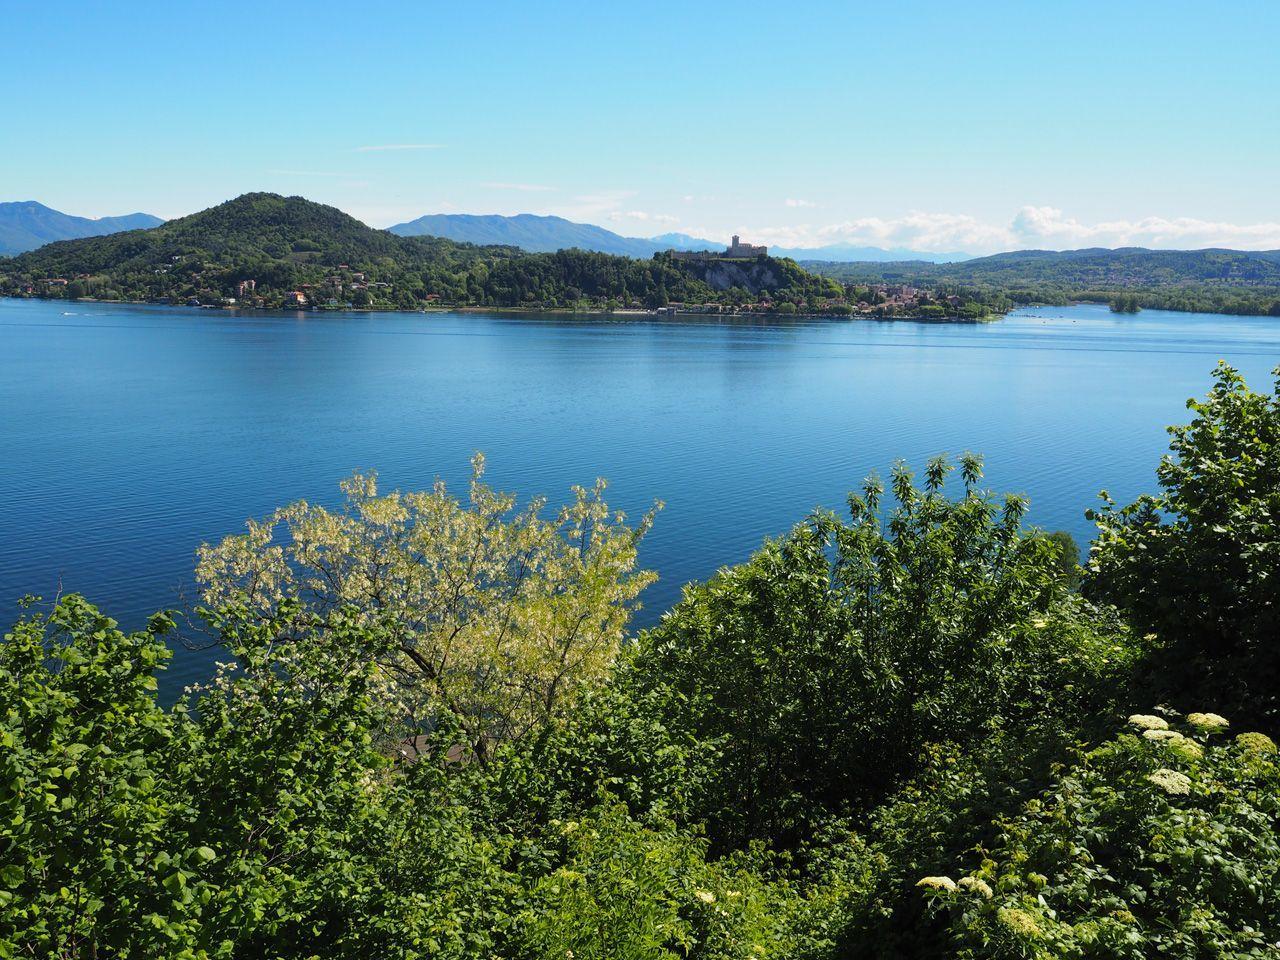 Arona villa vista lago 600mq con giardino